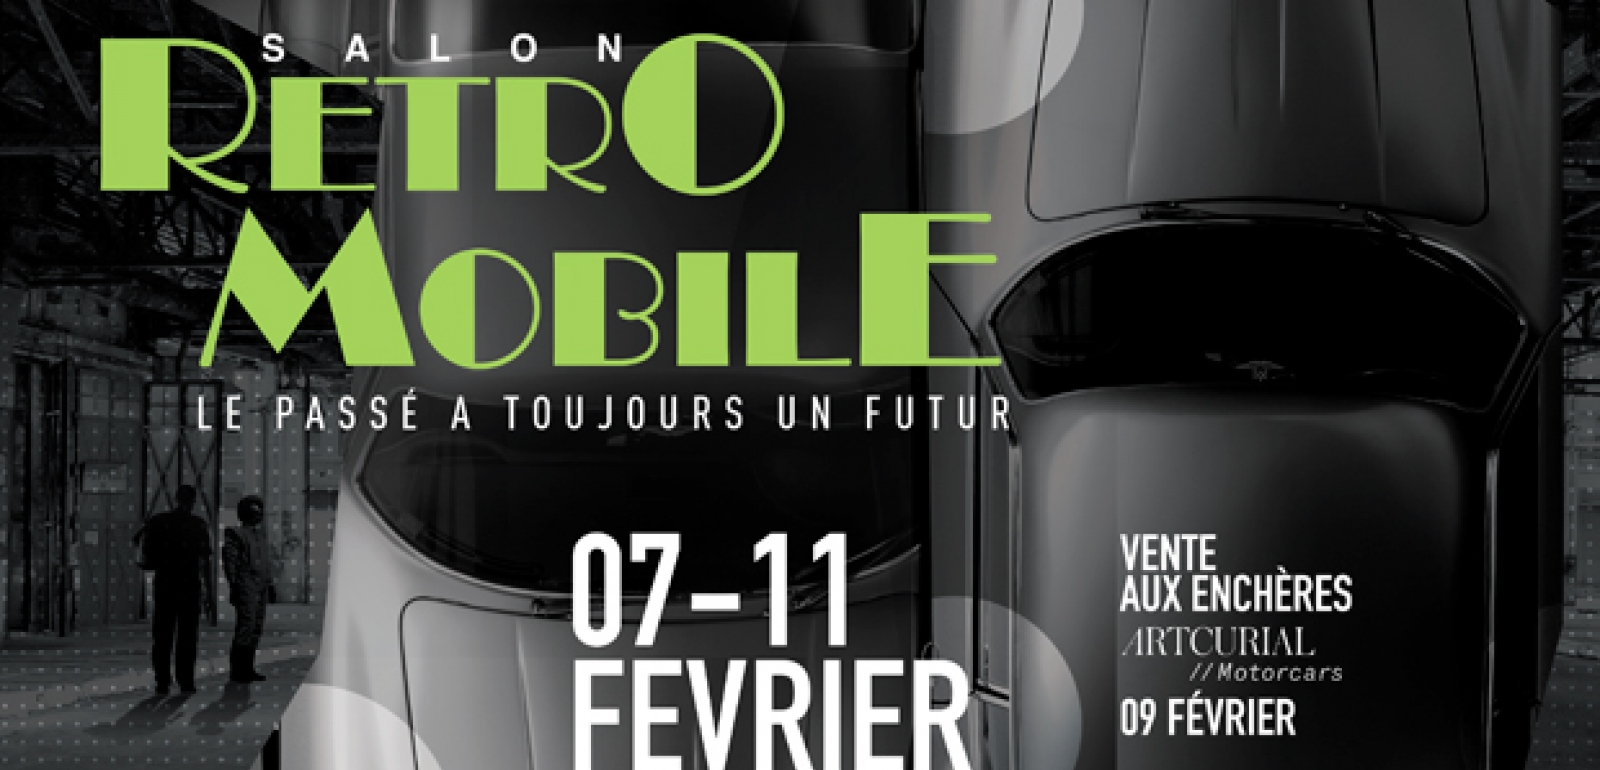 Rencontres mobiles paris 2018